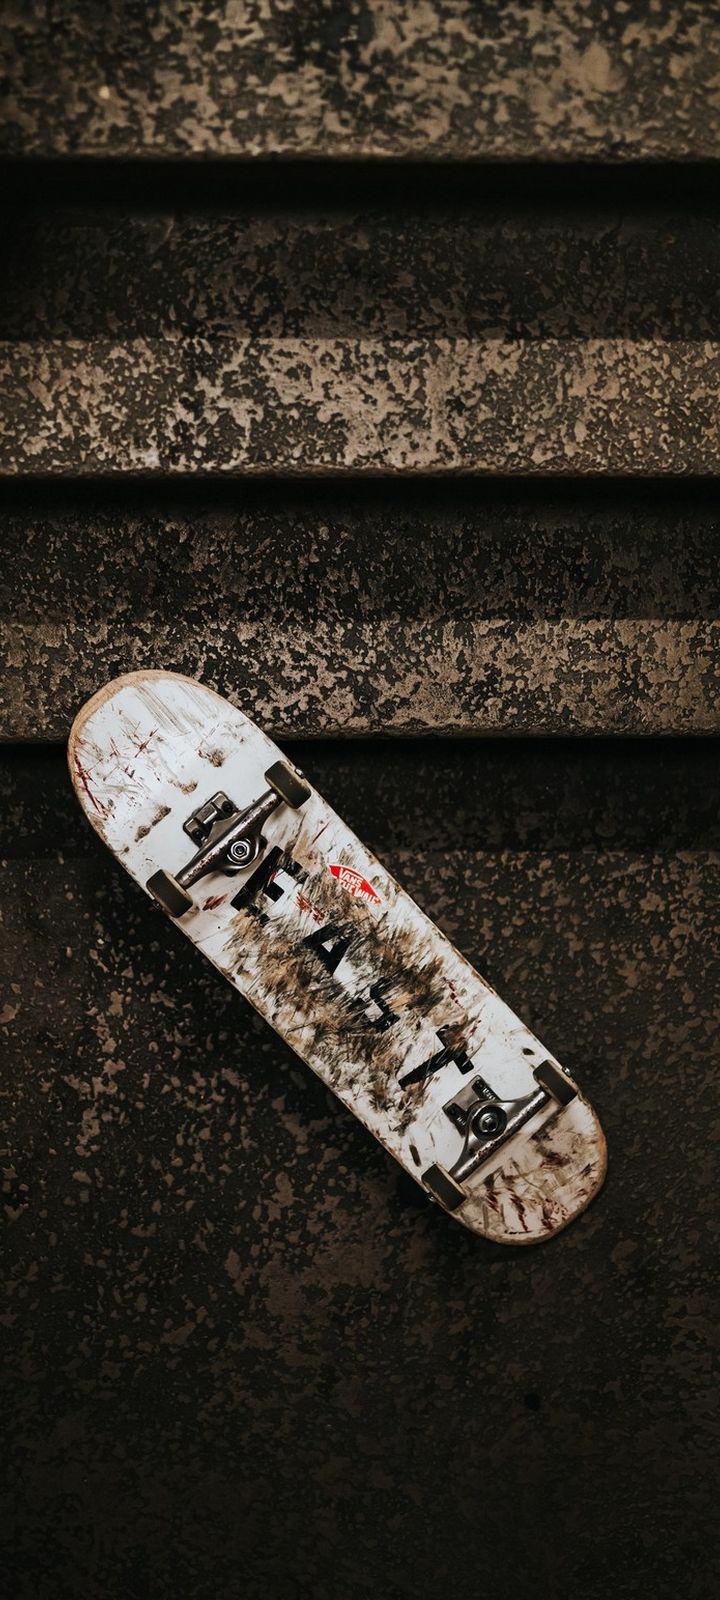 Skateboard Ladder Wheels Dirty Wallpaper 720x1600